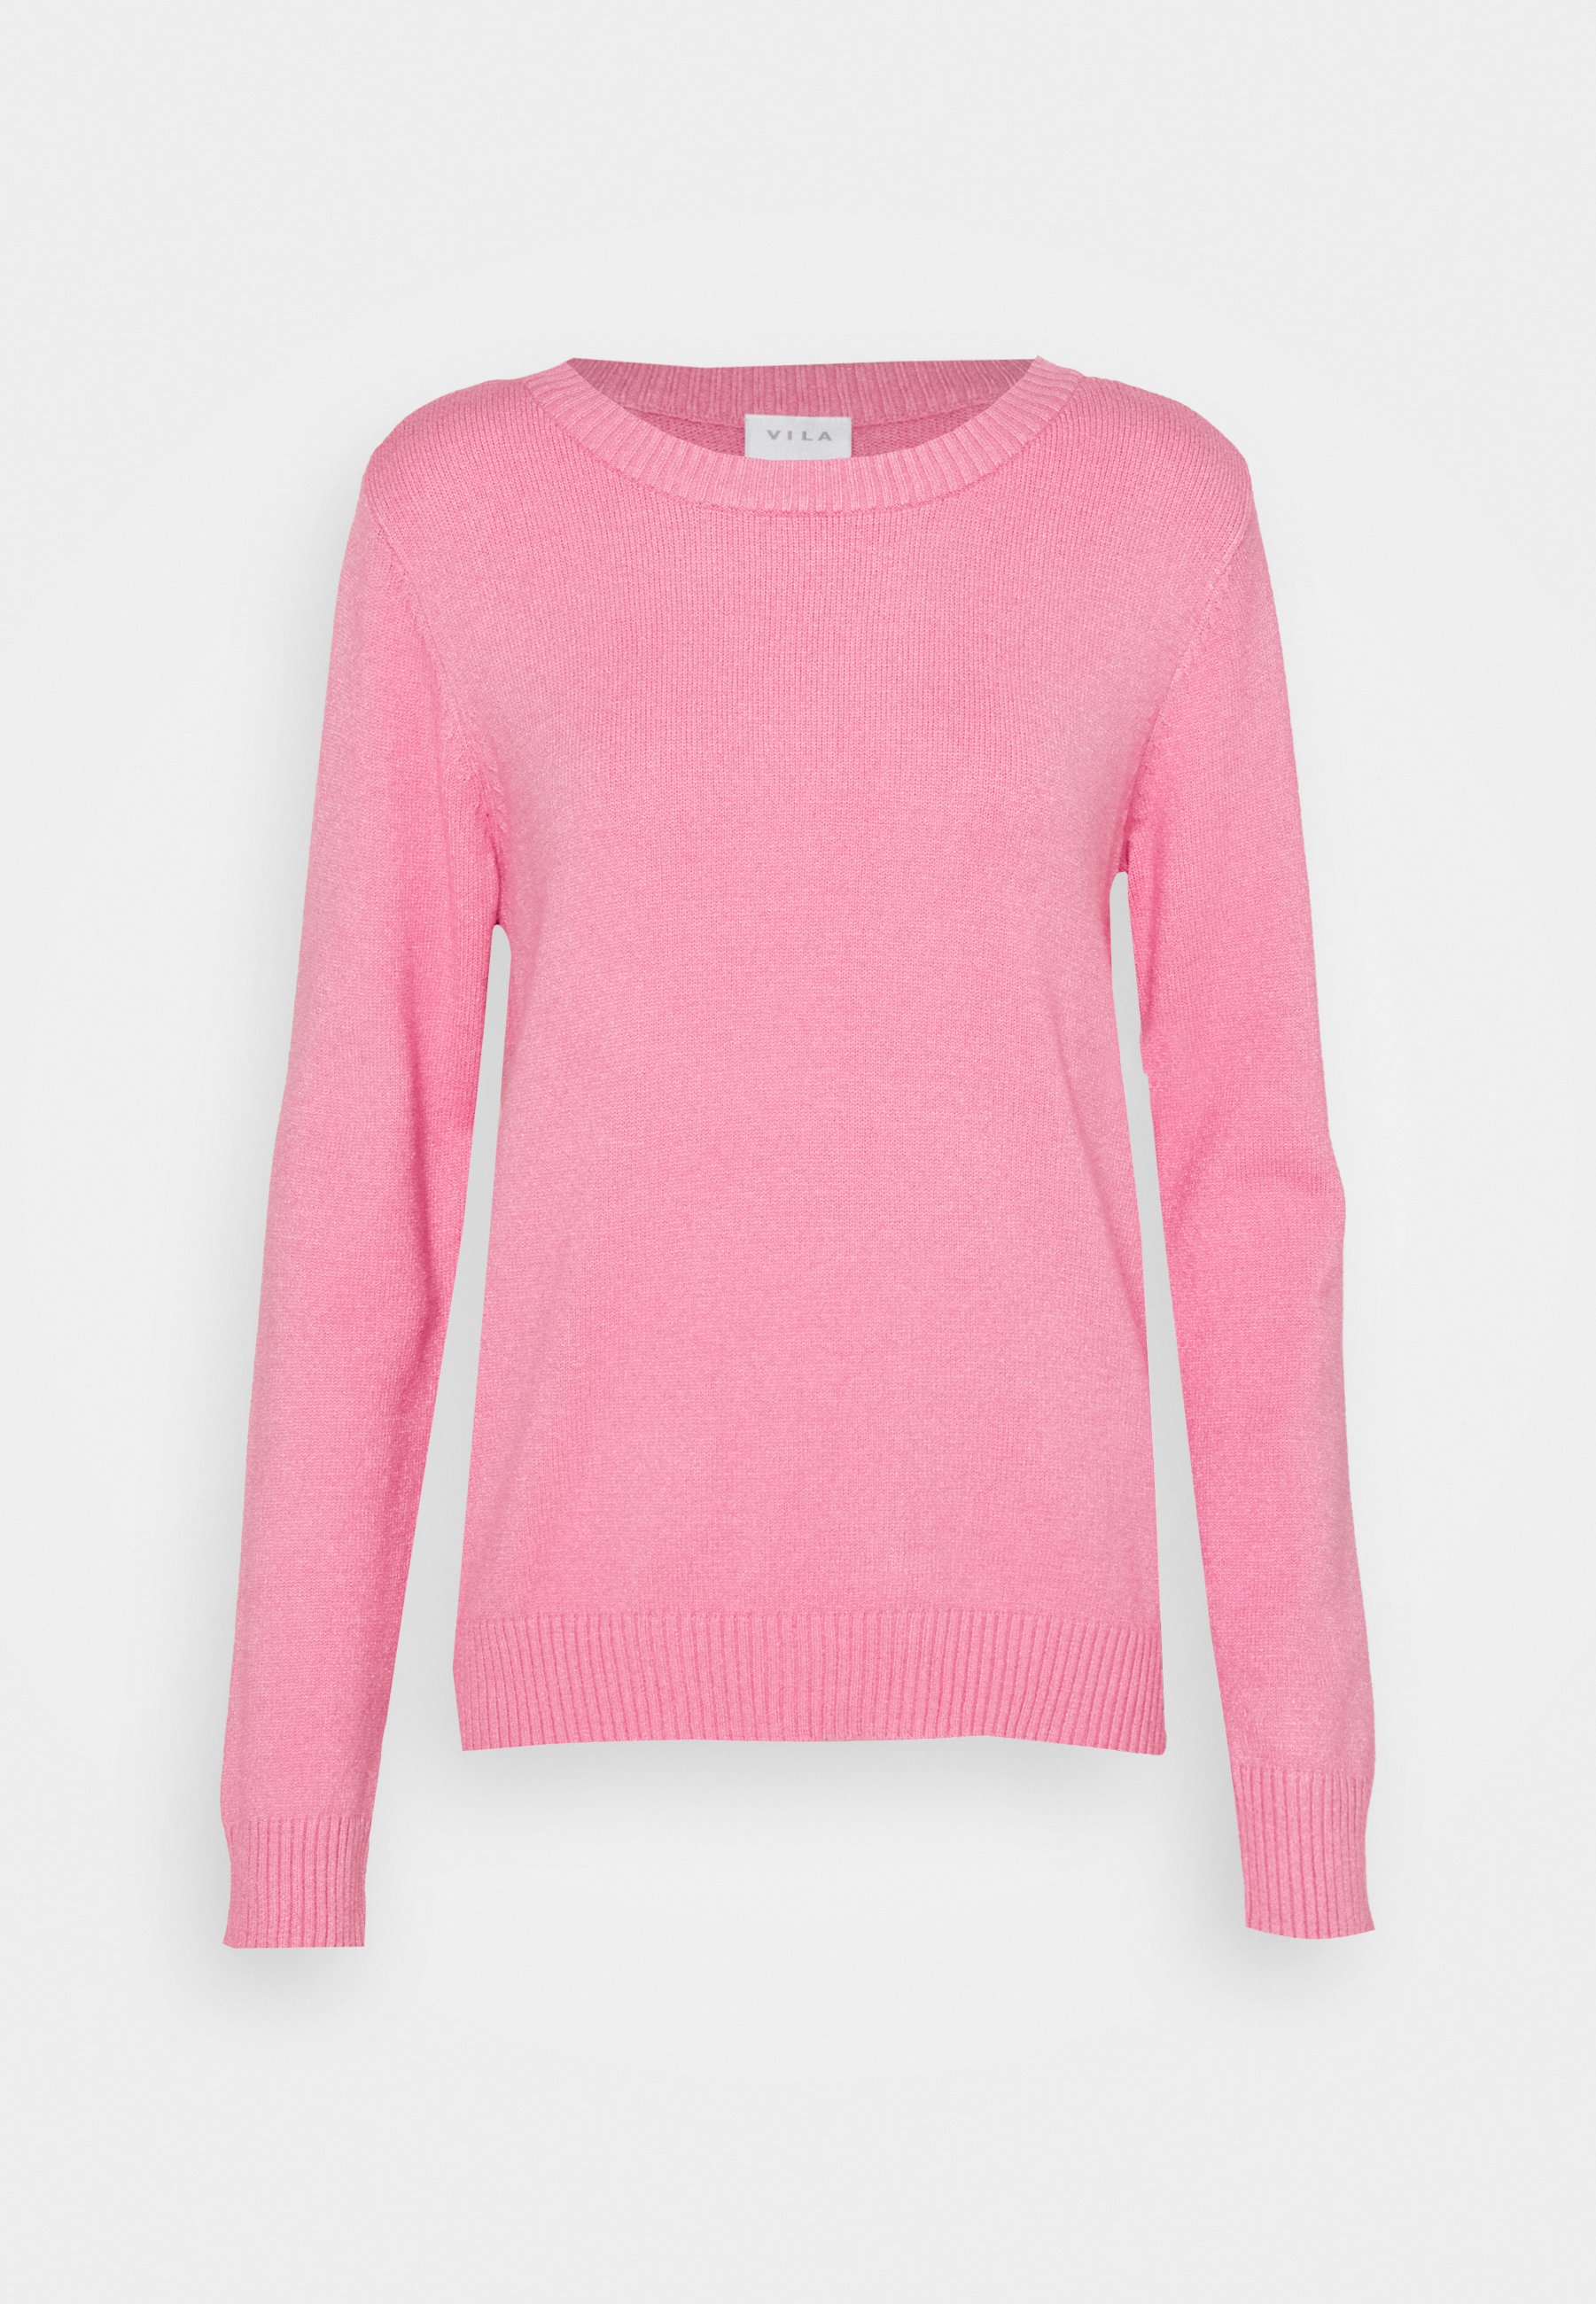 Femme VIRIL O NECK - Pullover